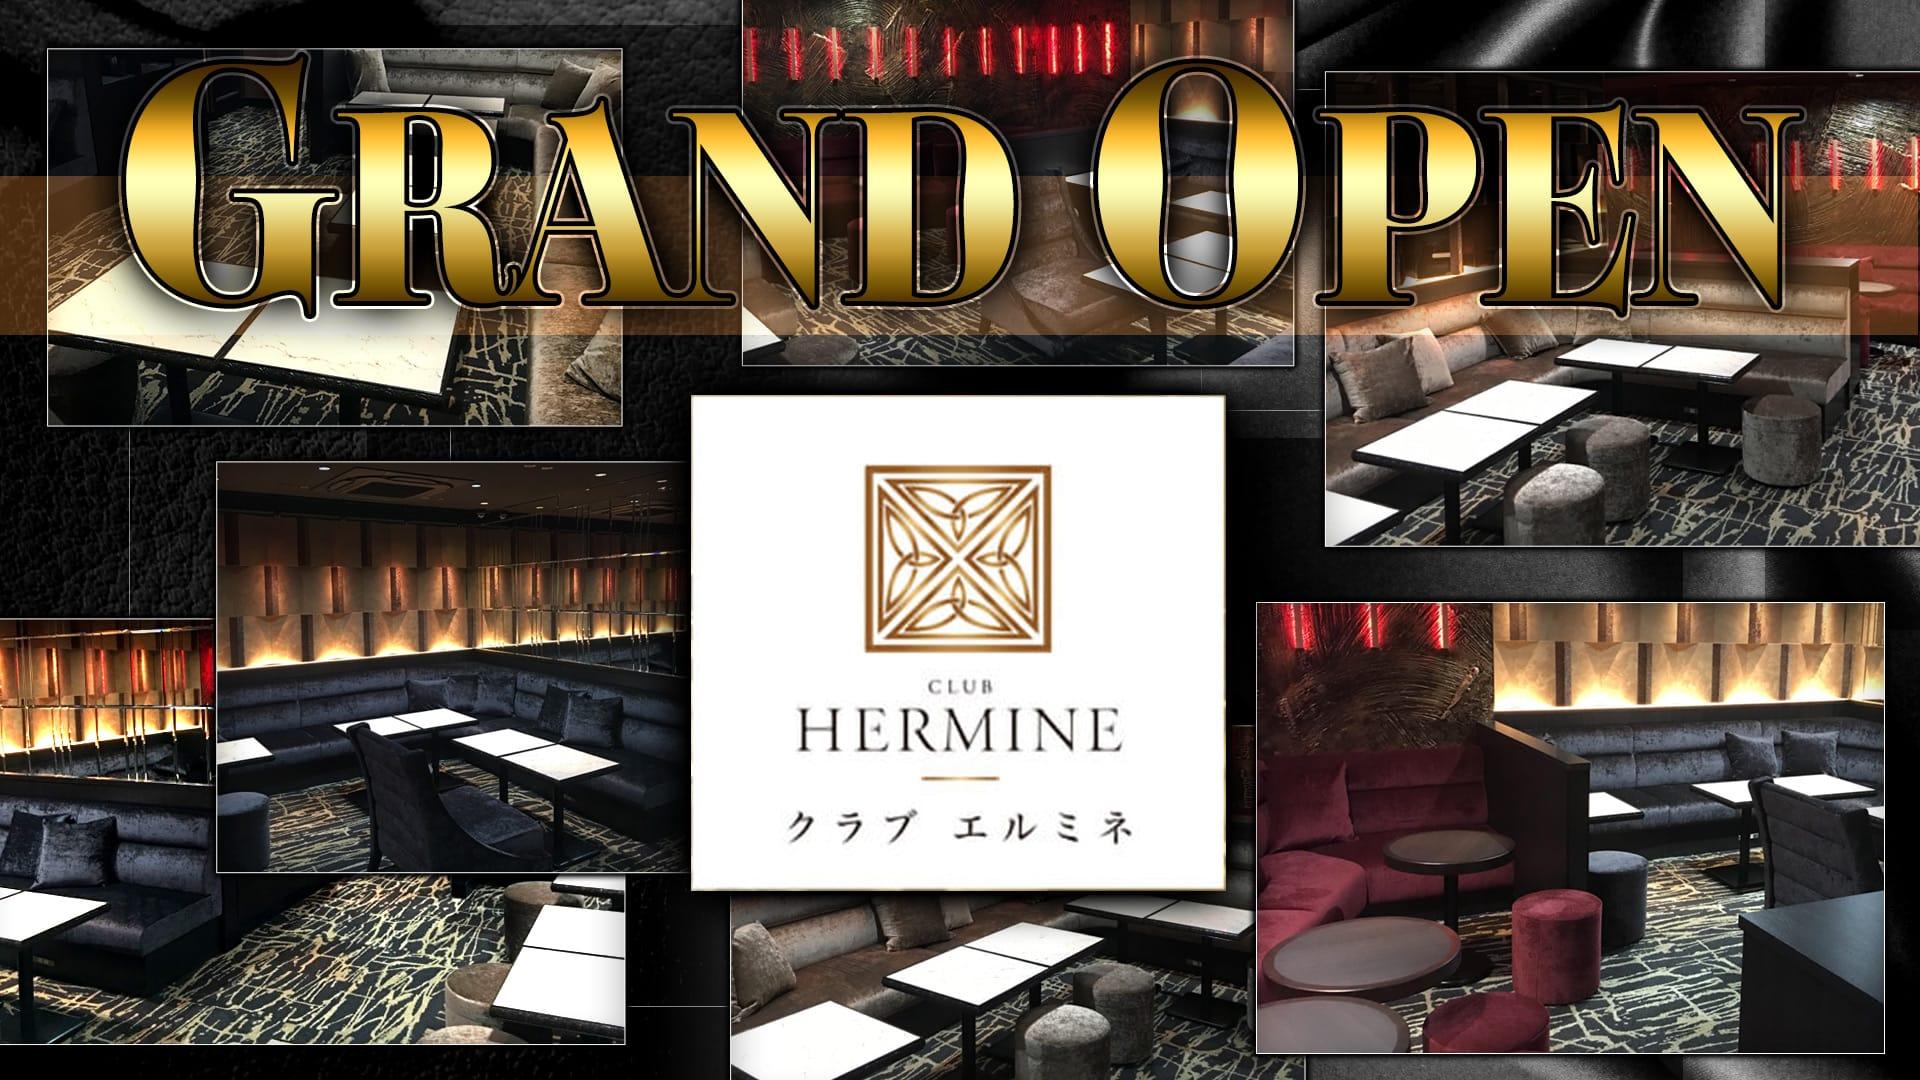 HERMINE 川崎~エルミネ~ 川崎 キャバクラ TOP画像